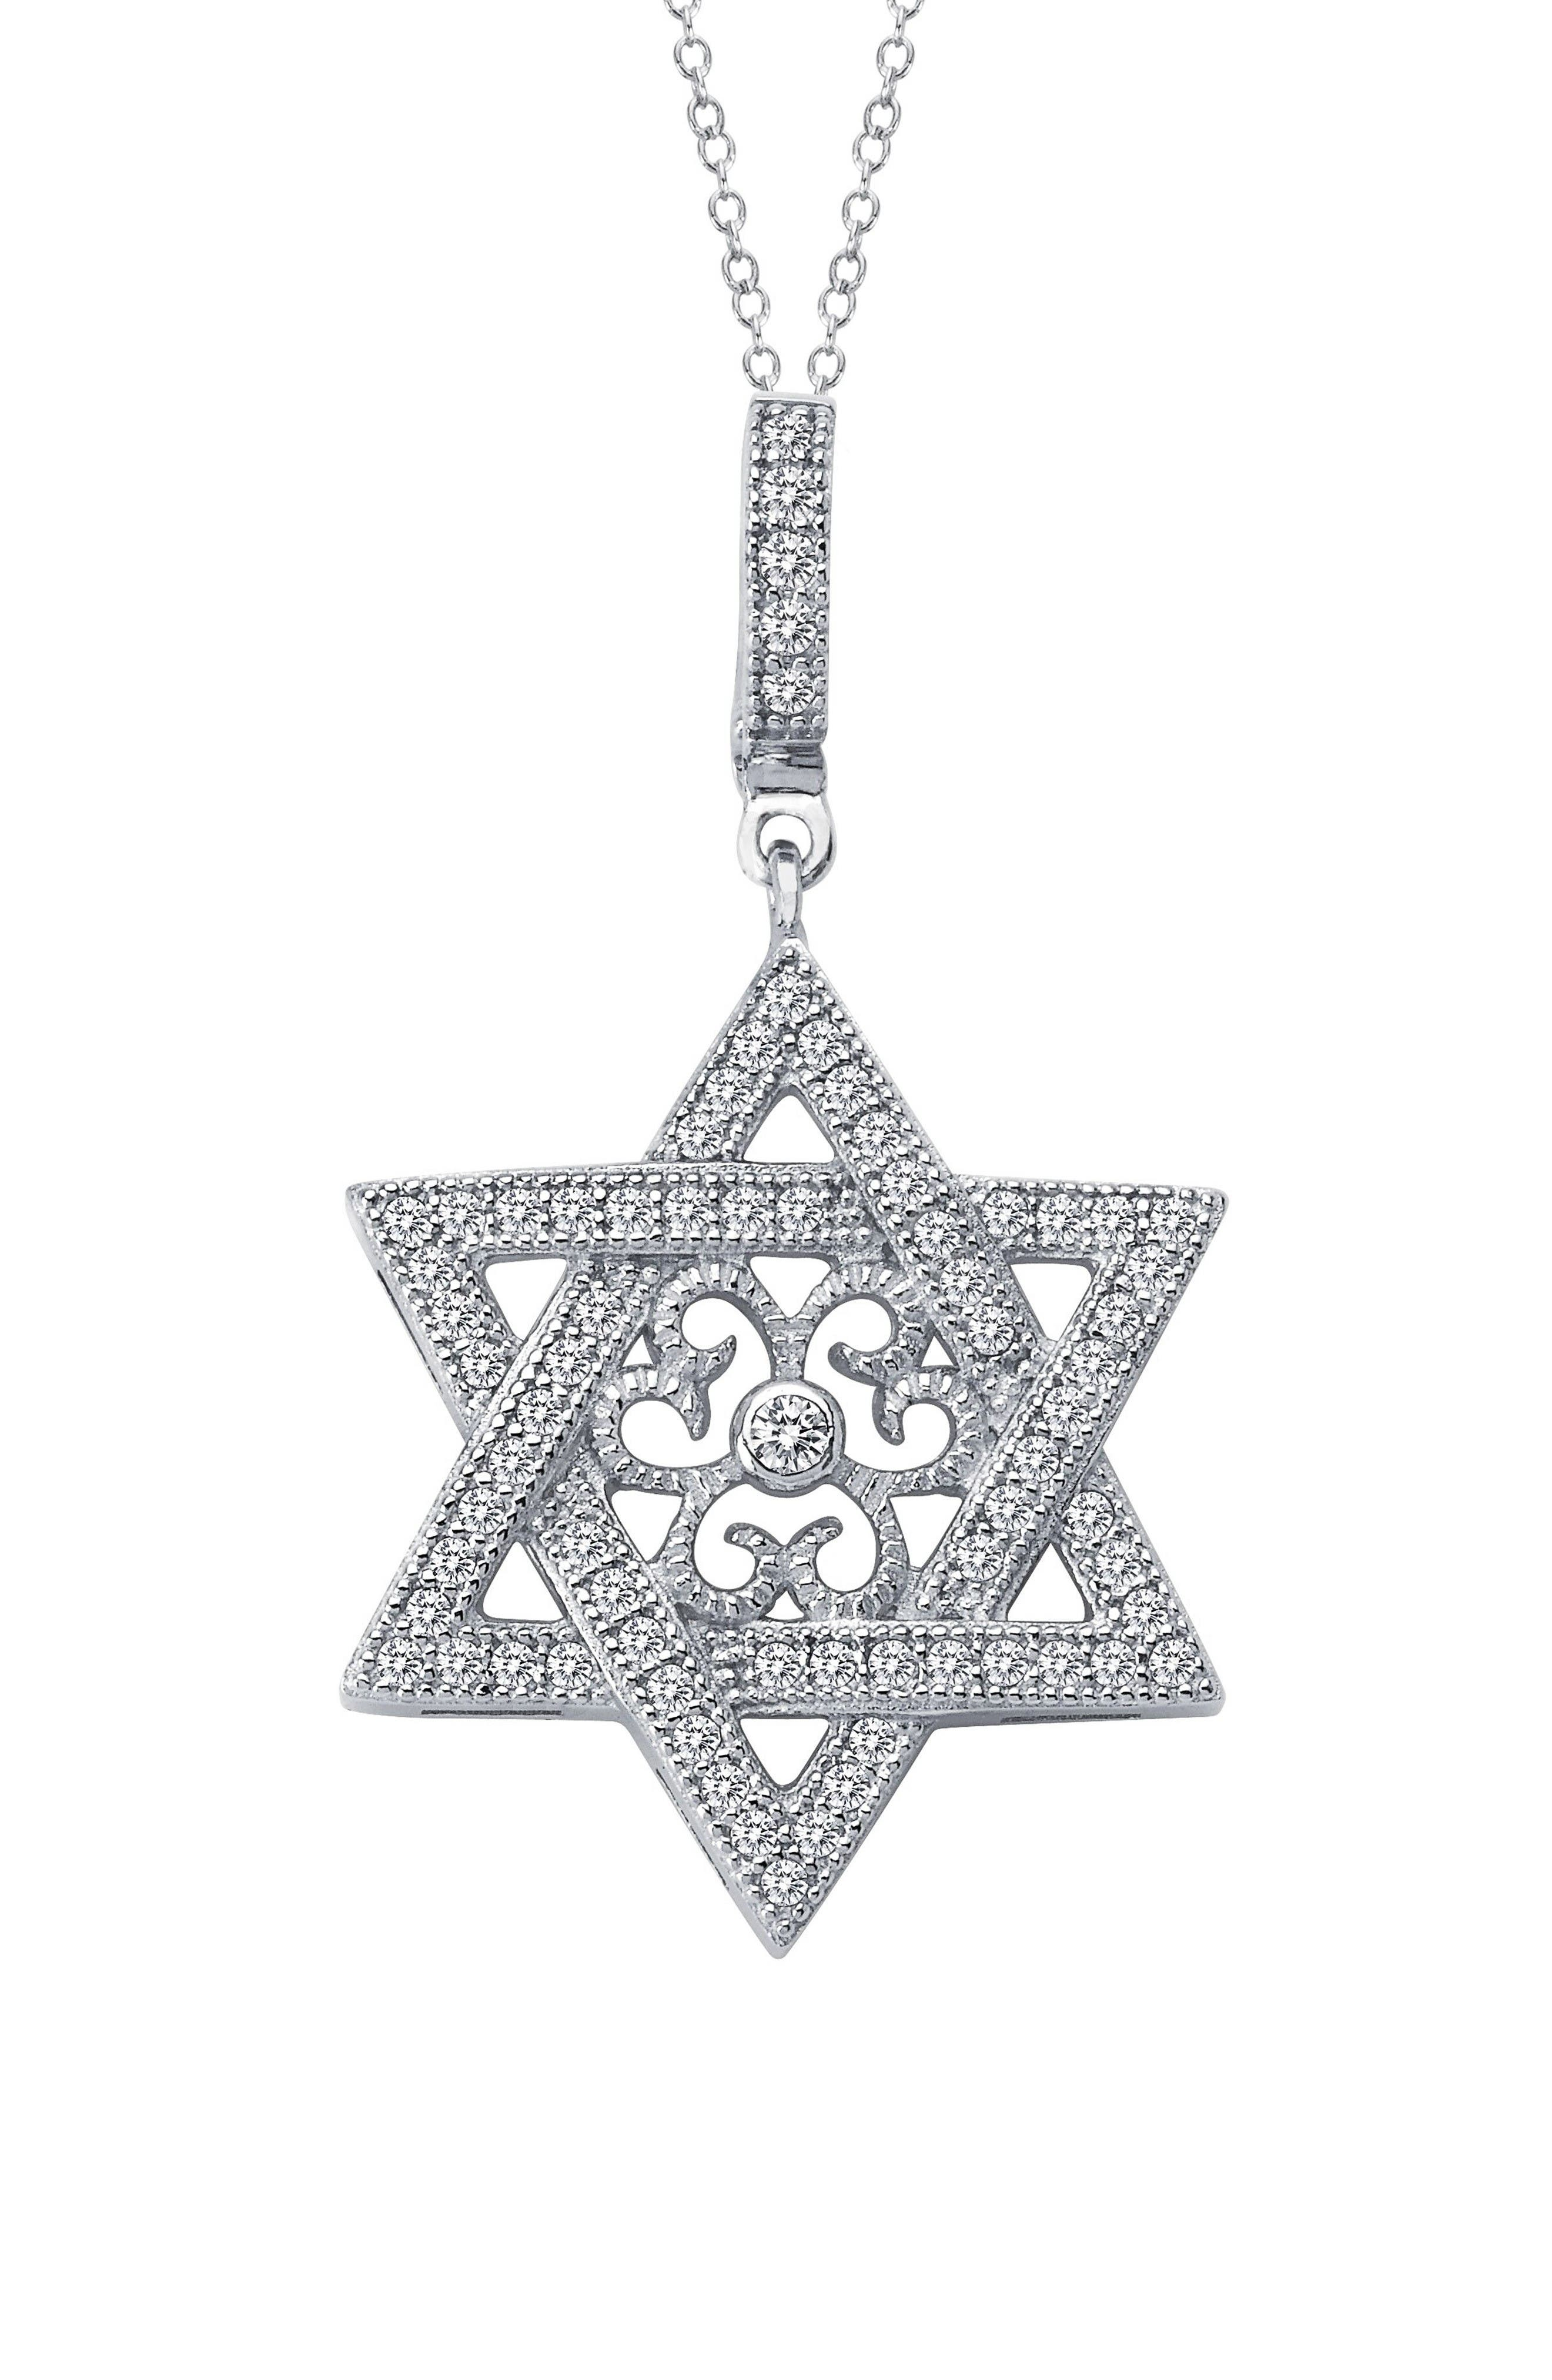 Main Image - Lafonn Star of David Simulated Diamond Pendant Necklace